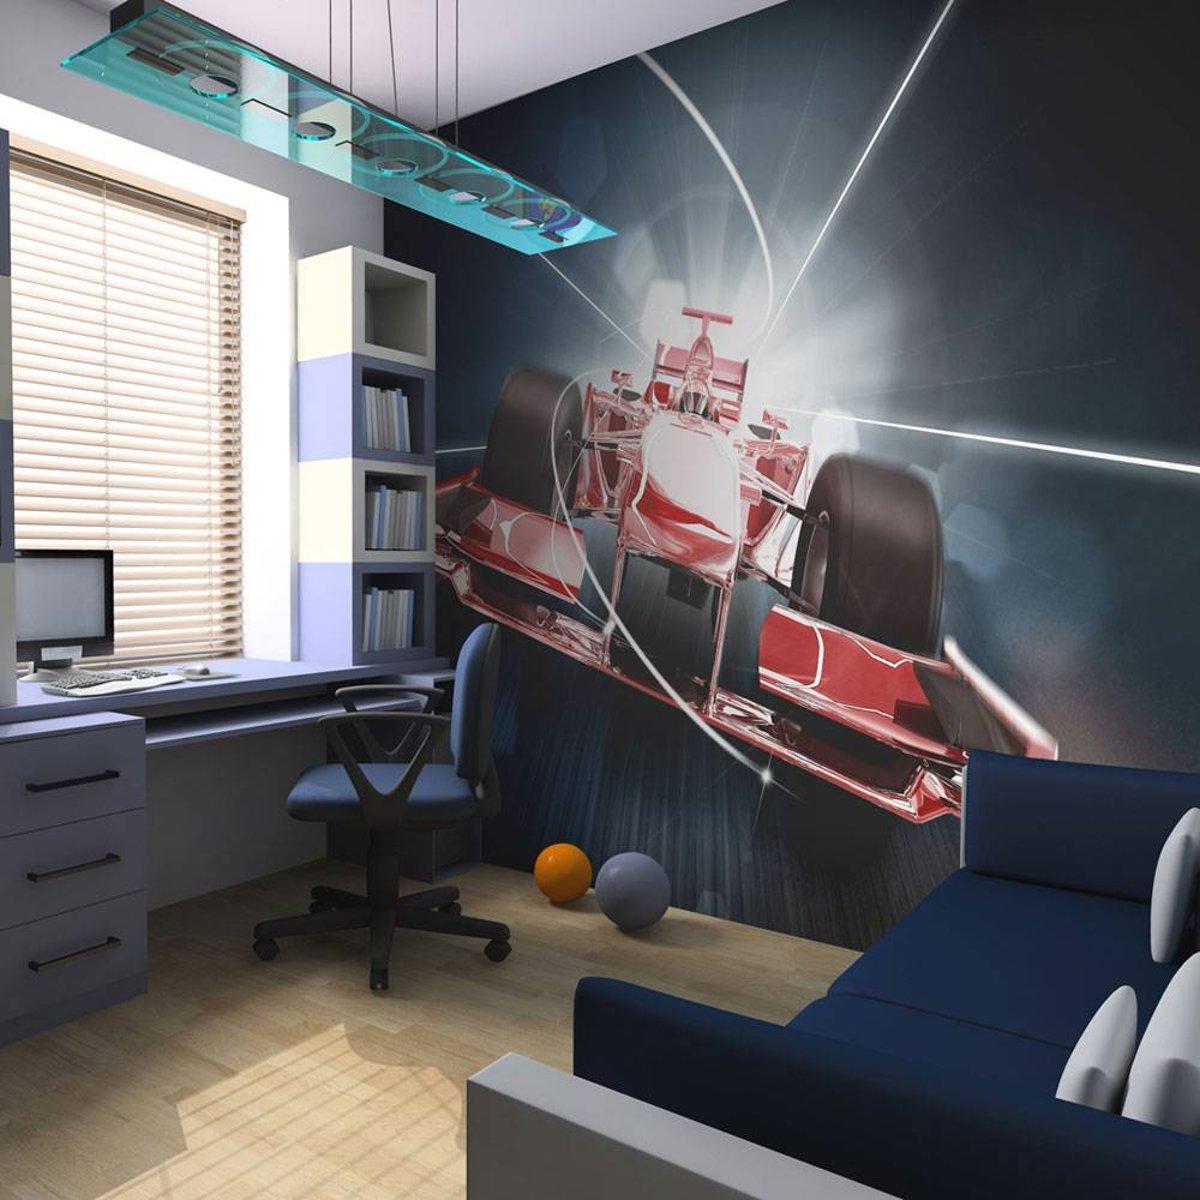 Fotobehang - Snelheid en dynamiek van de Formule 1 - 250x193